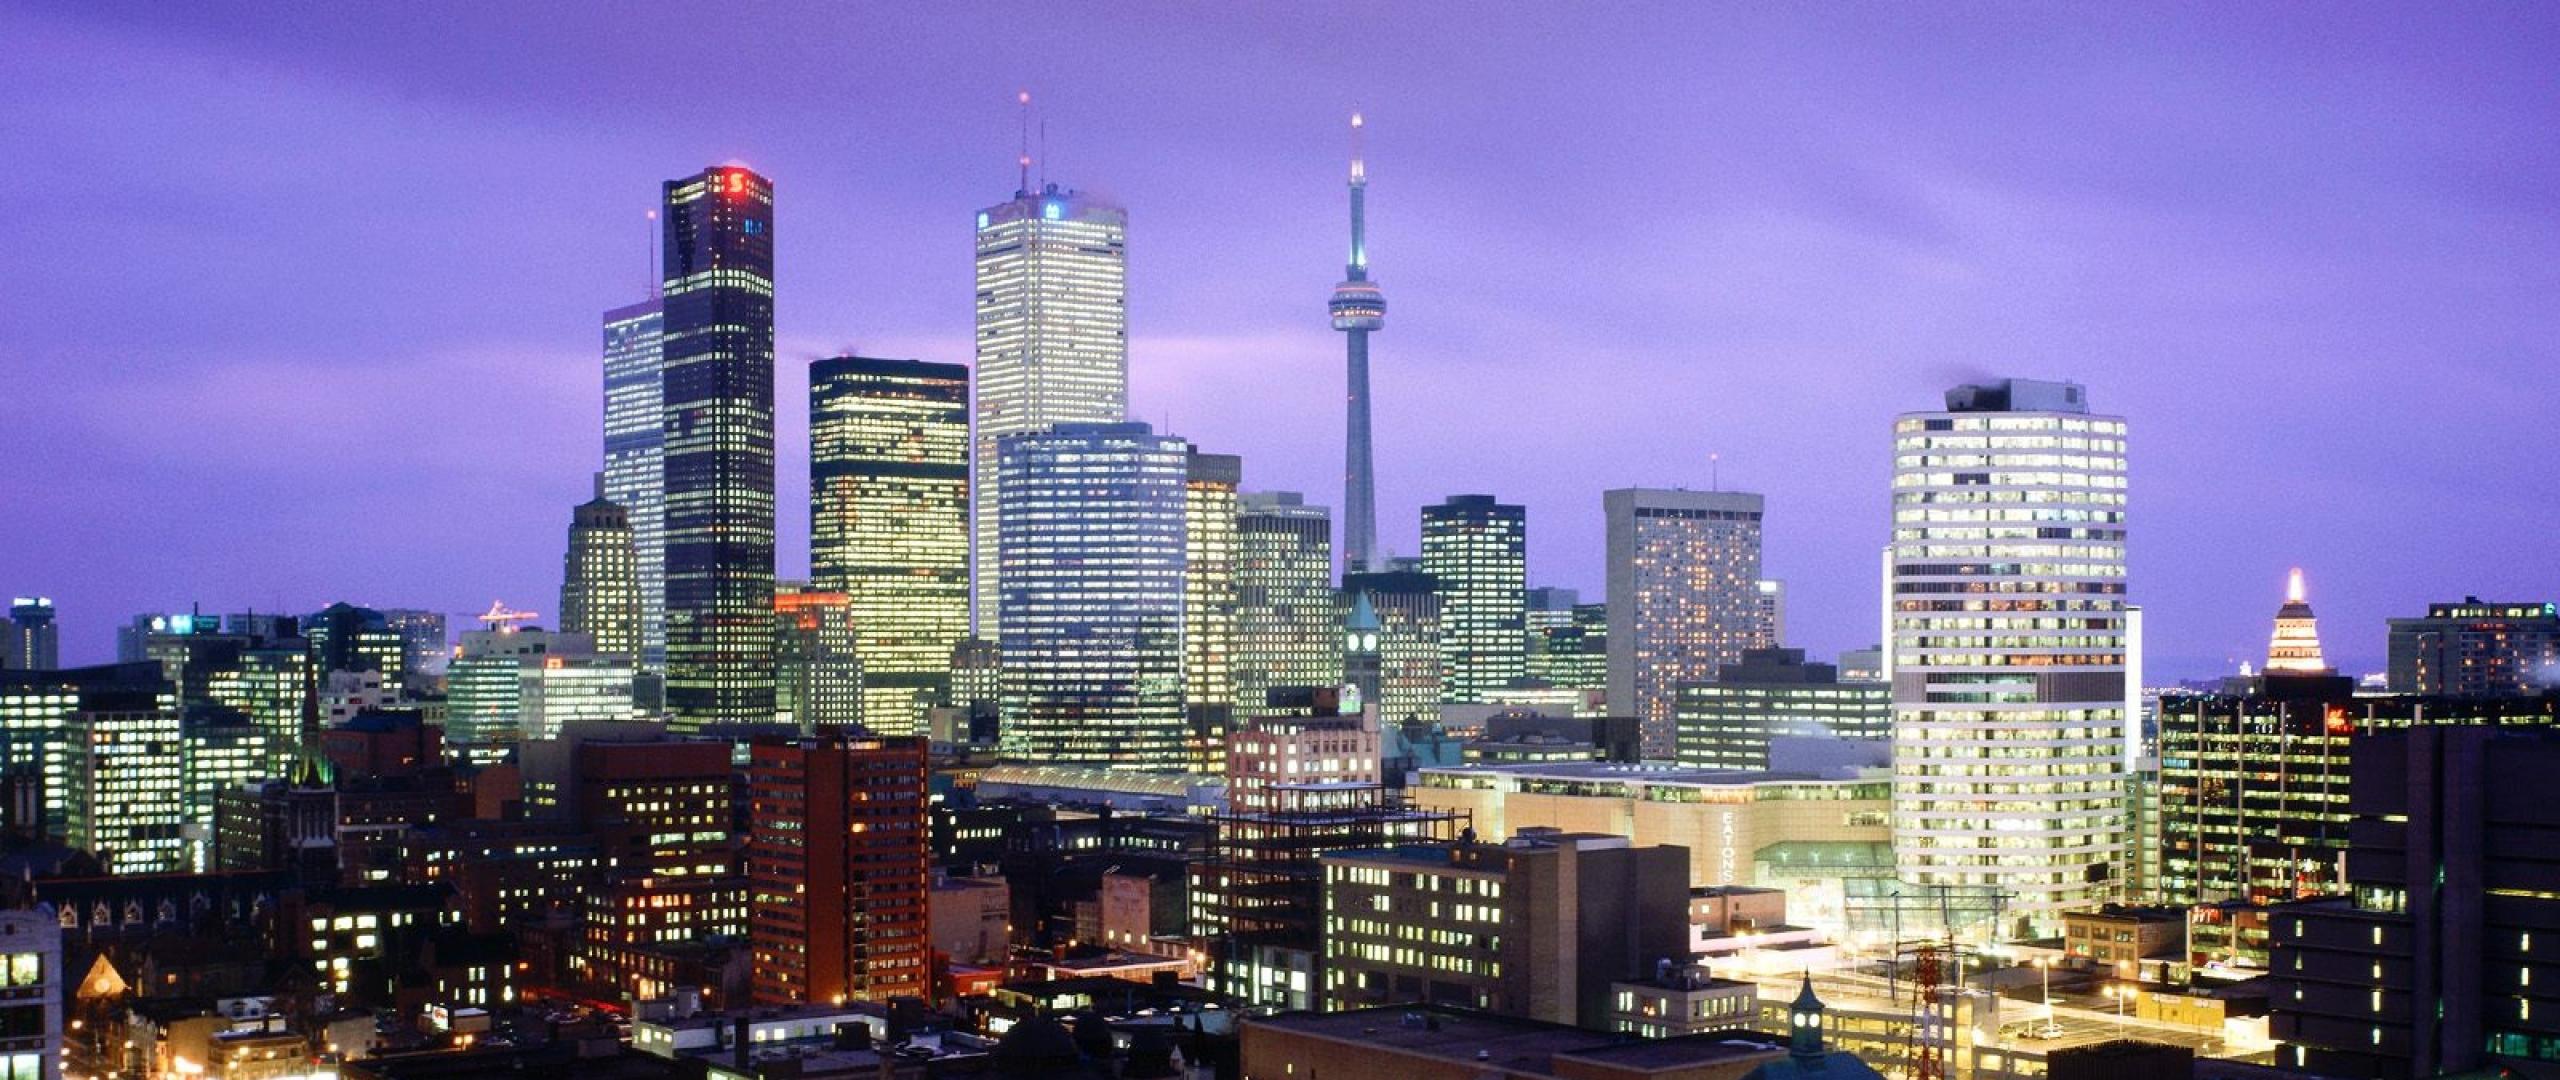 Toronto Canada Night City Lights Light Wallpaper Background 2560x1080